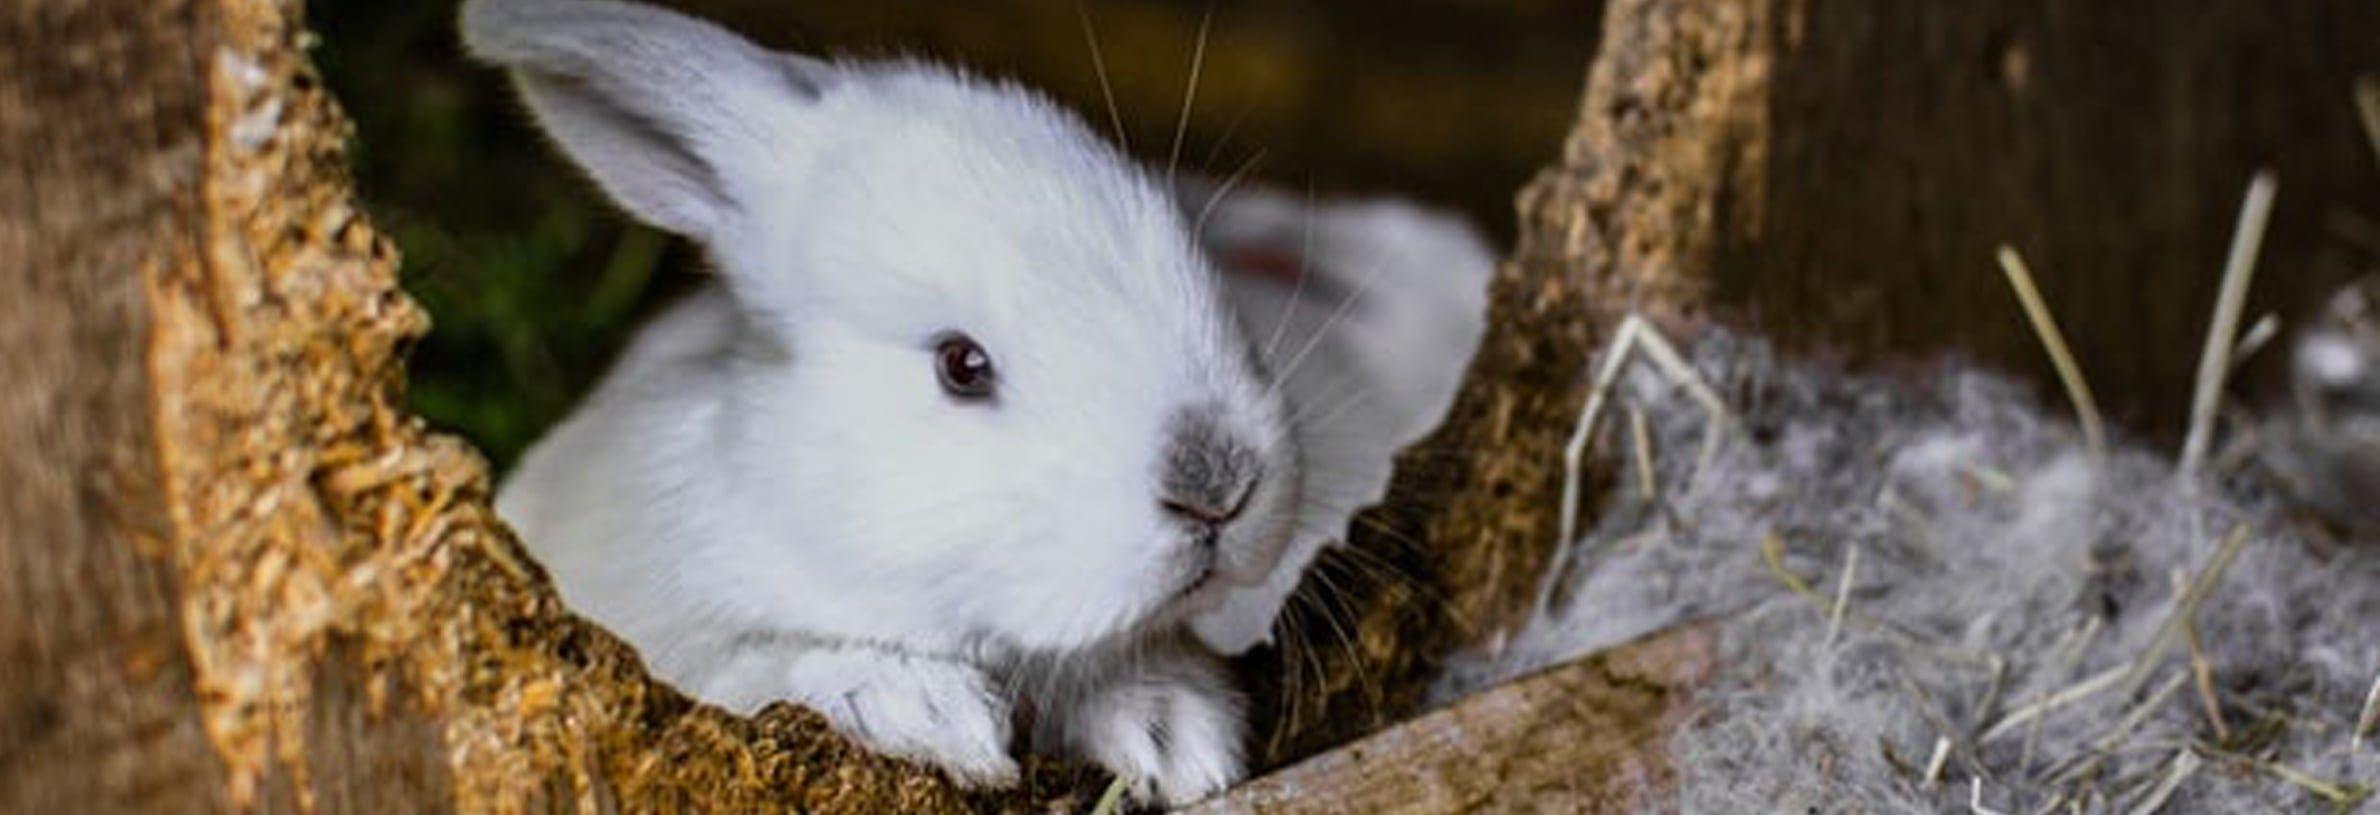 konijnenren maken